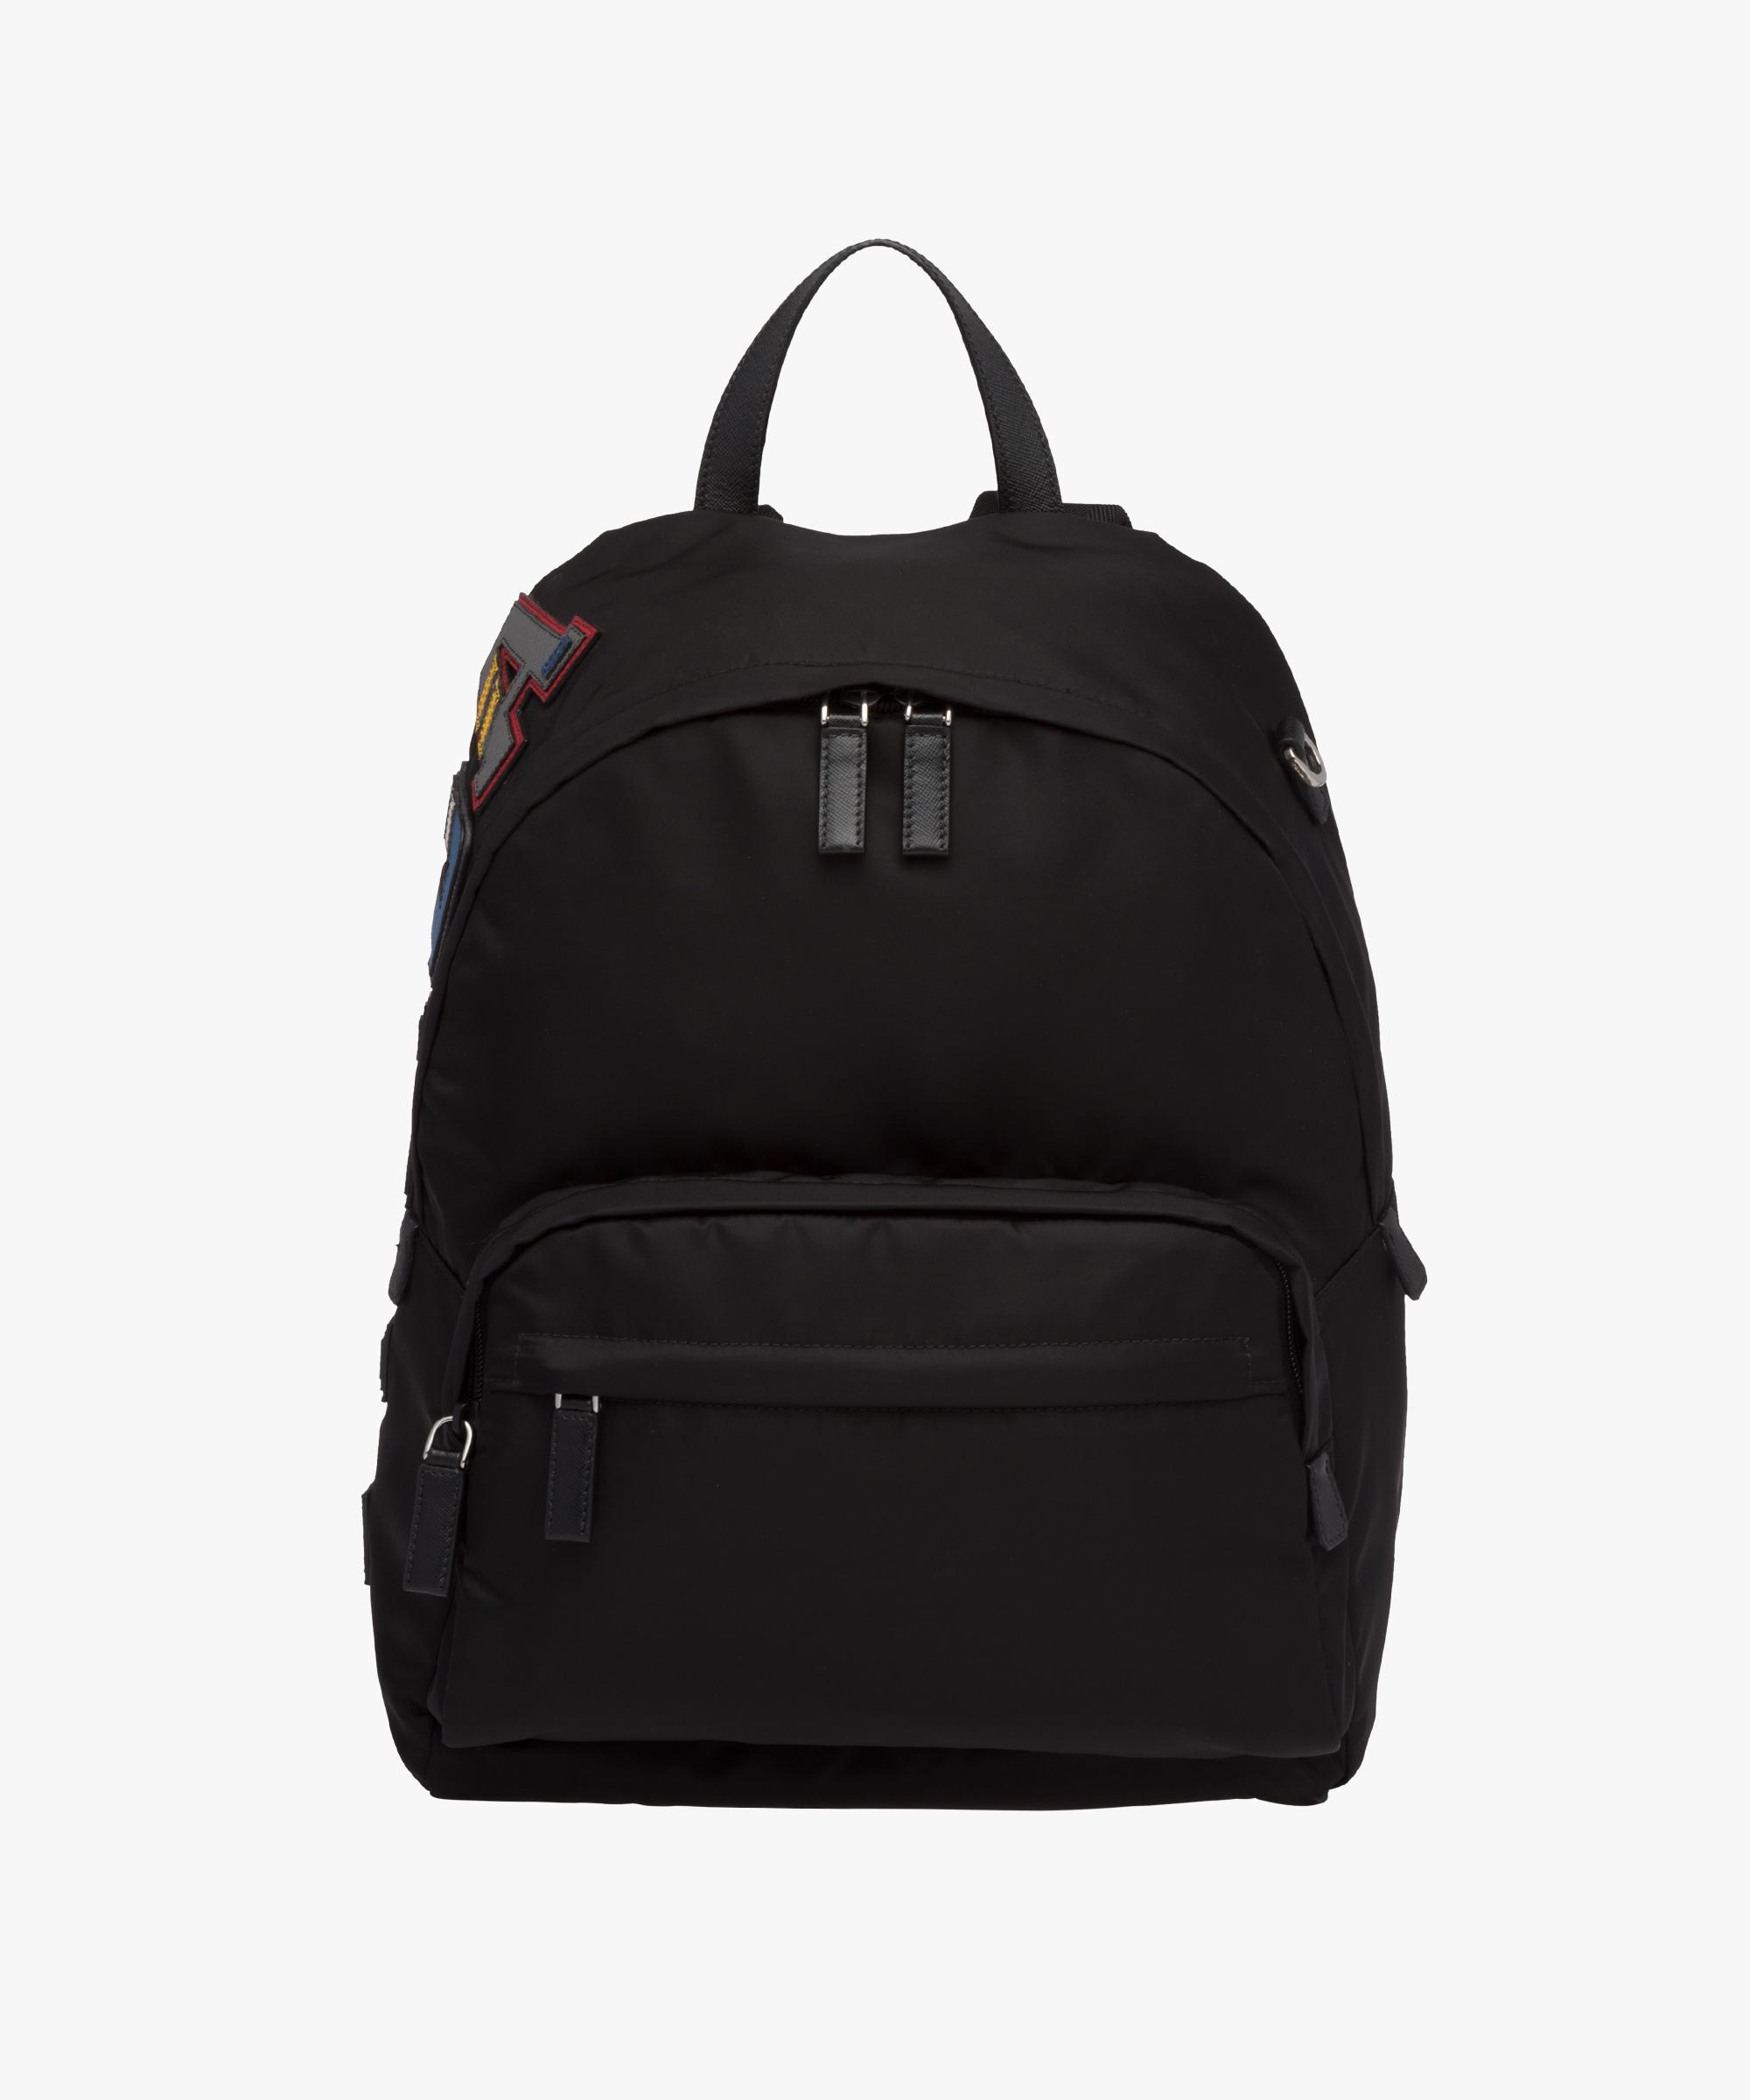 ireland prada vela messenger bag f6283 034cd  amazon lyst prada nylon and saffiano  leather backpack in black for men 29050 77019 dd4e461b29403